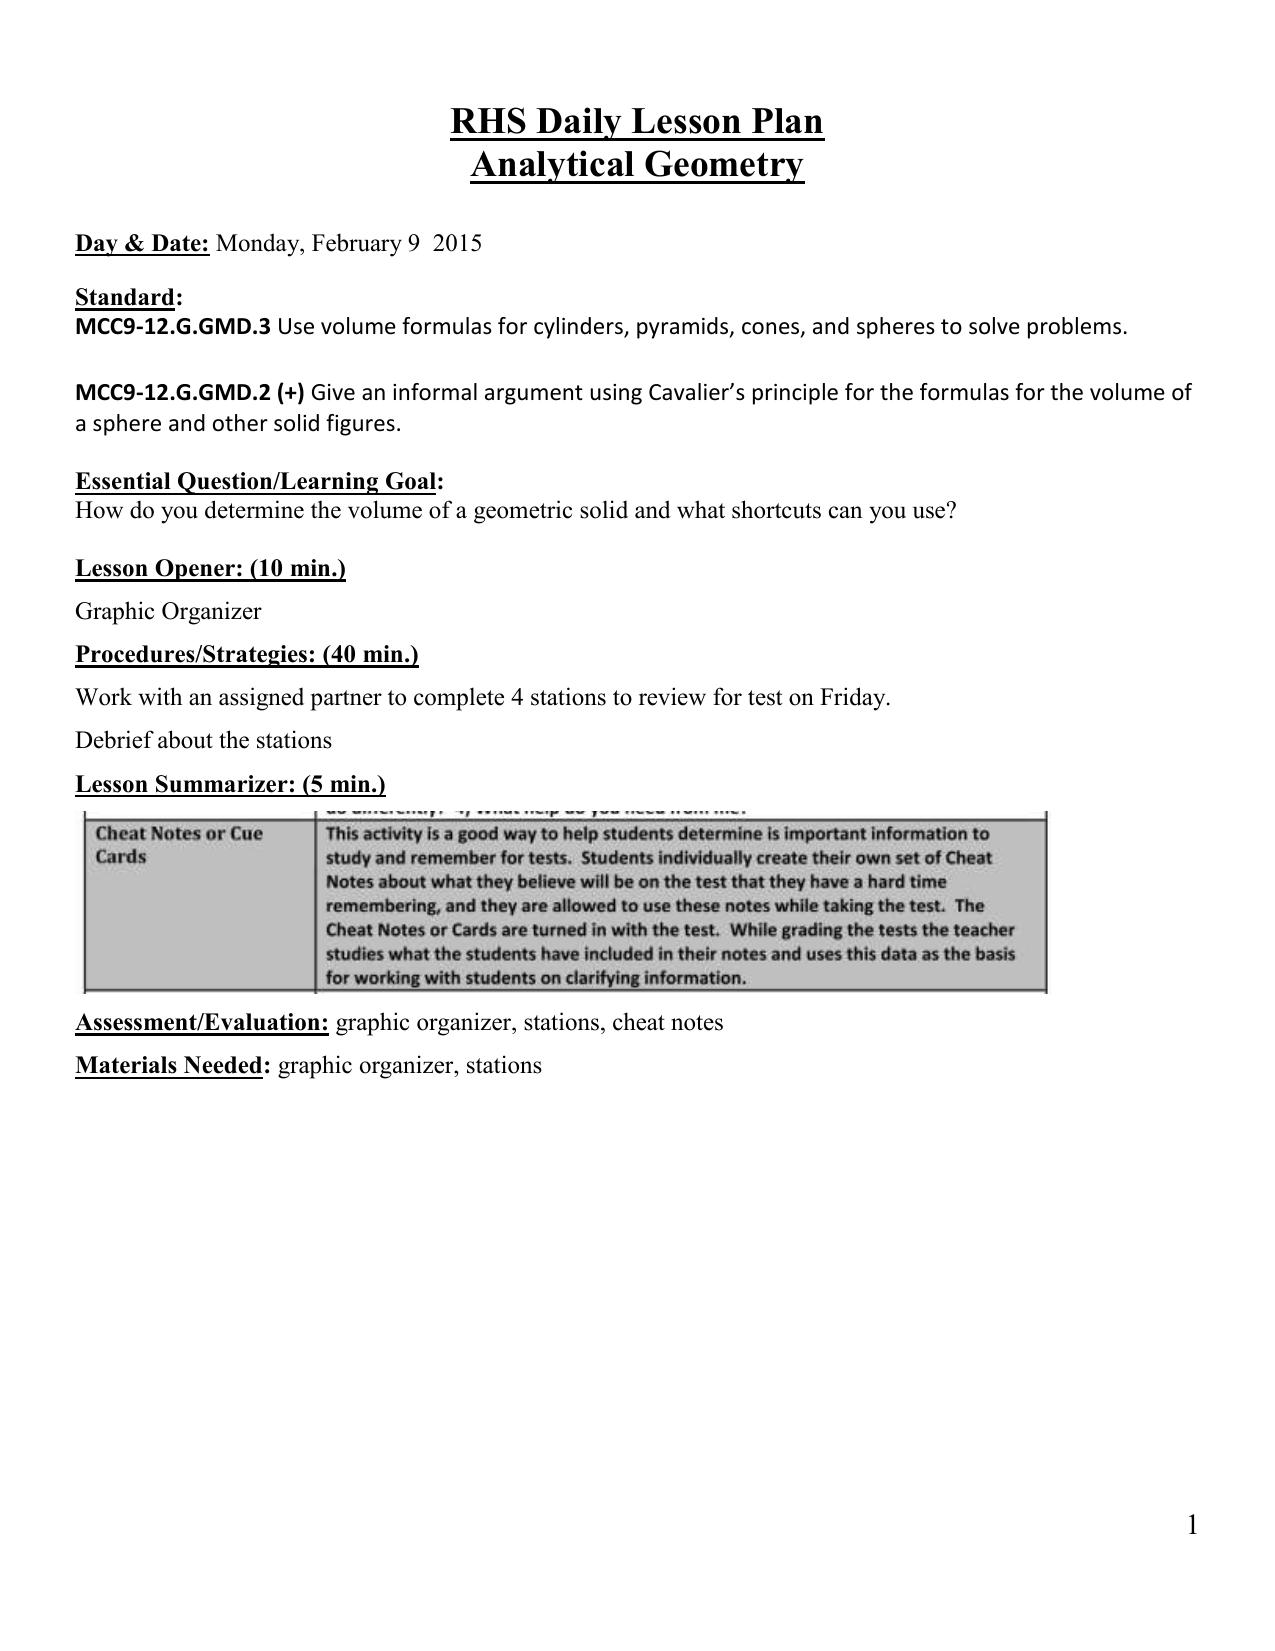 Rhs Daily Lesson Plan Analytical Geometry Venn Diagram For Smartboard 009524905 1 605e7c3a949545aceca5644b8ae79314